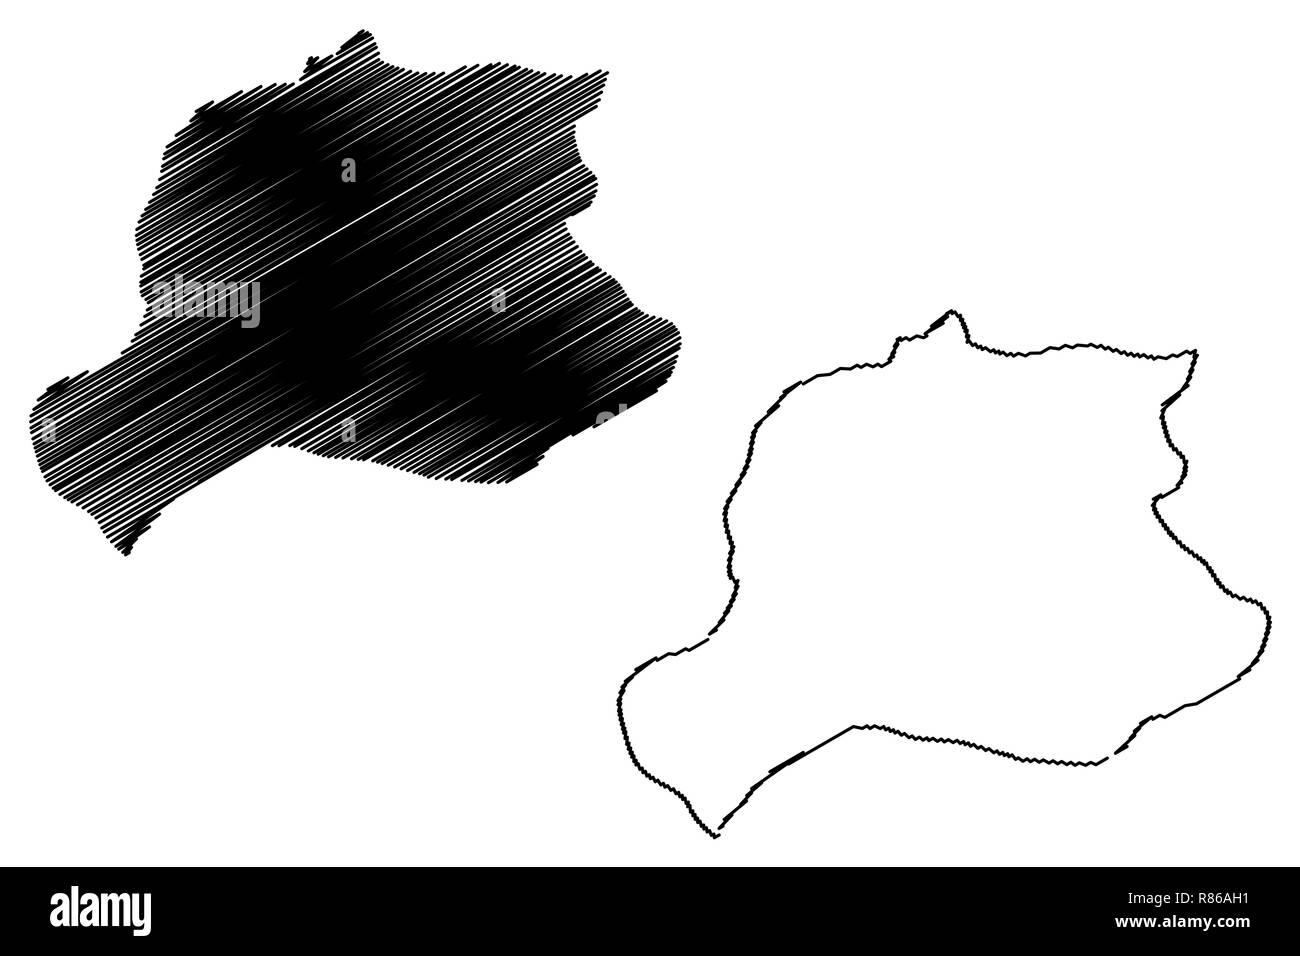 Bayburt (Provinces of the Republic of Turkey) map vector illustration, scribble sketch Bayburt ili map - Stock Image